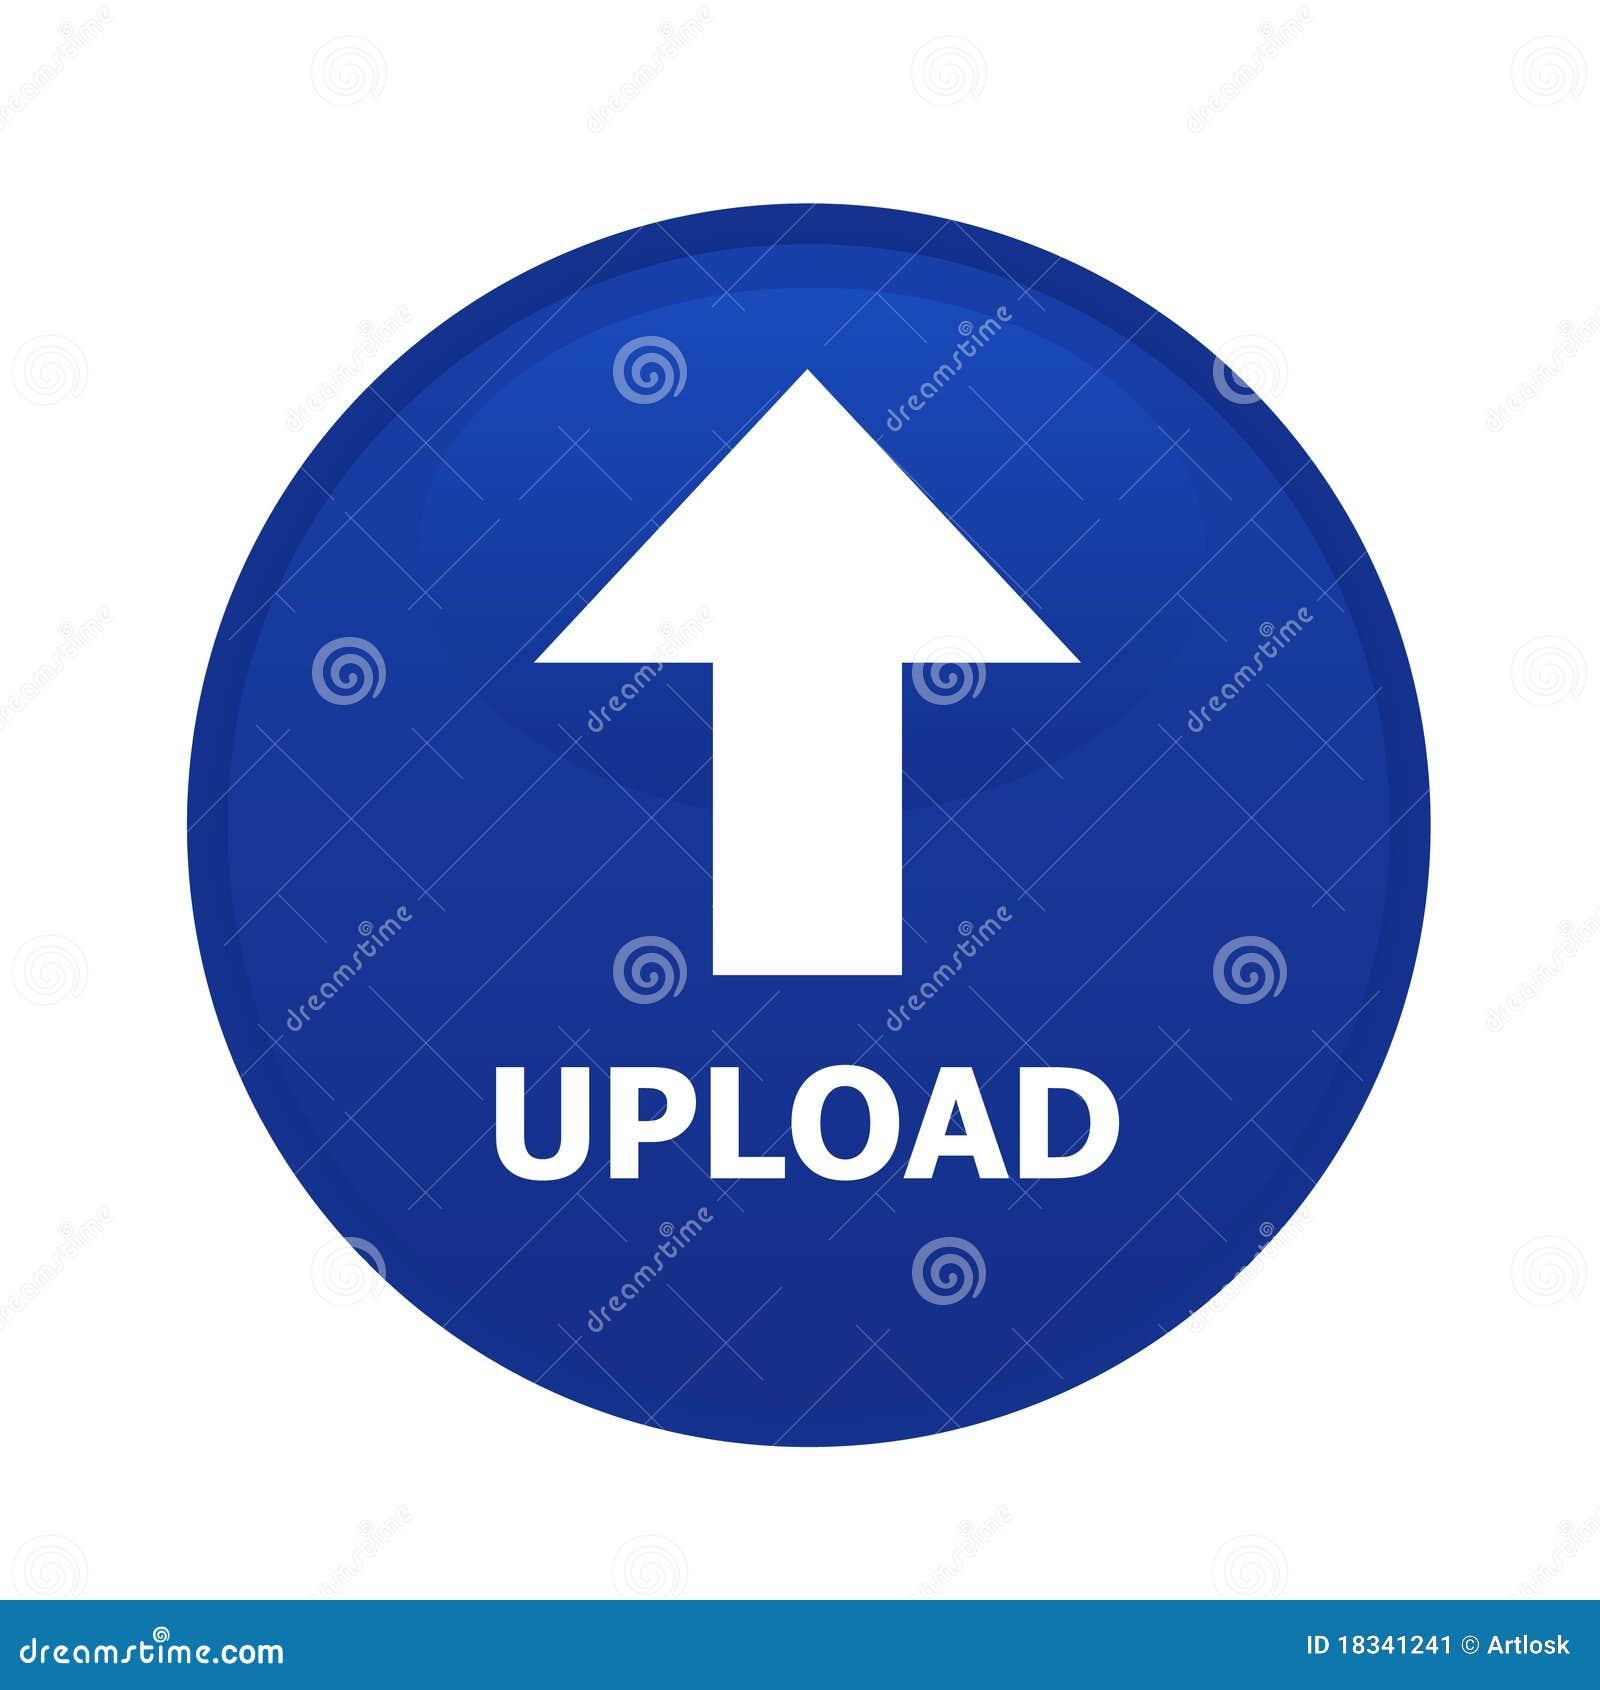 uupload